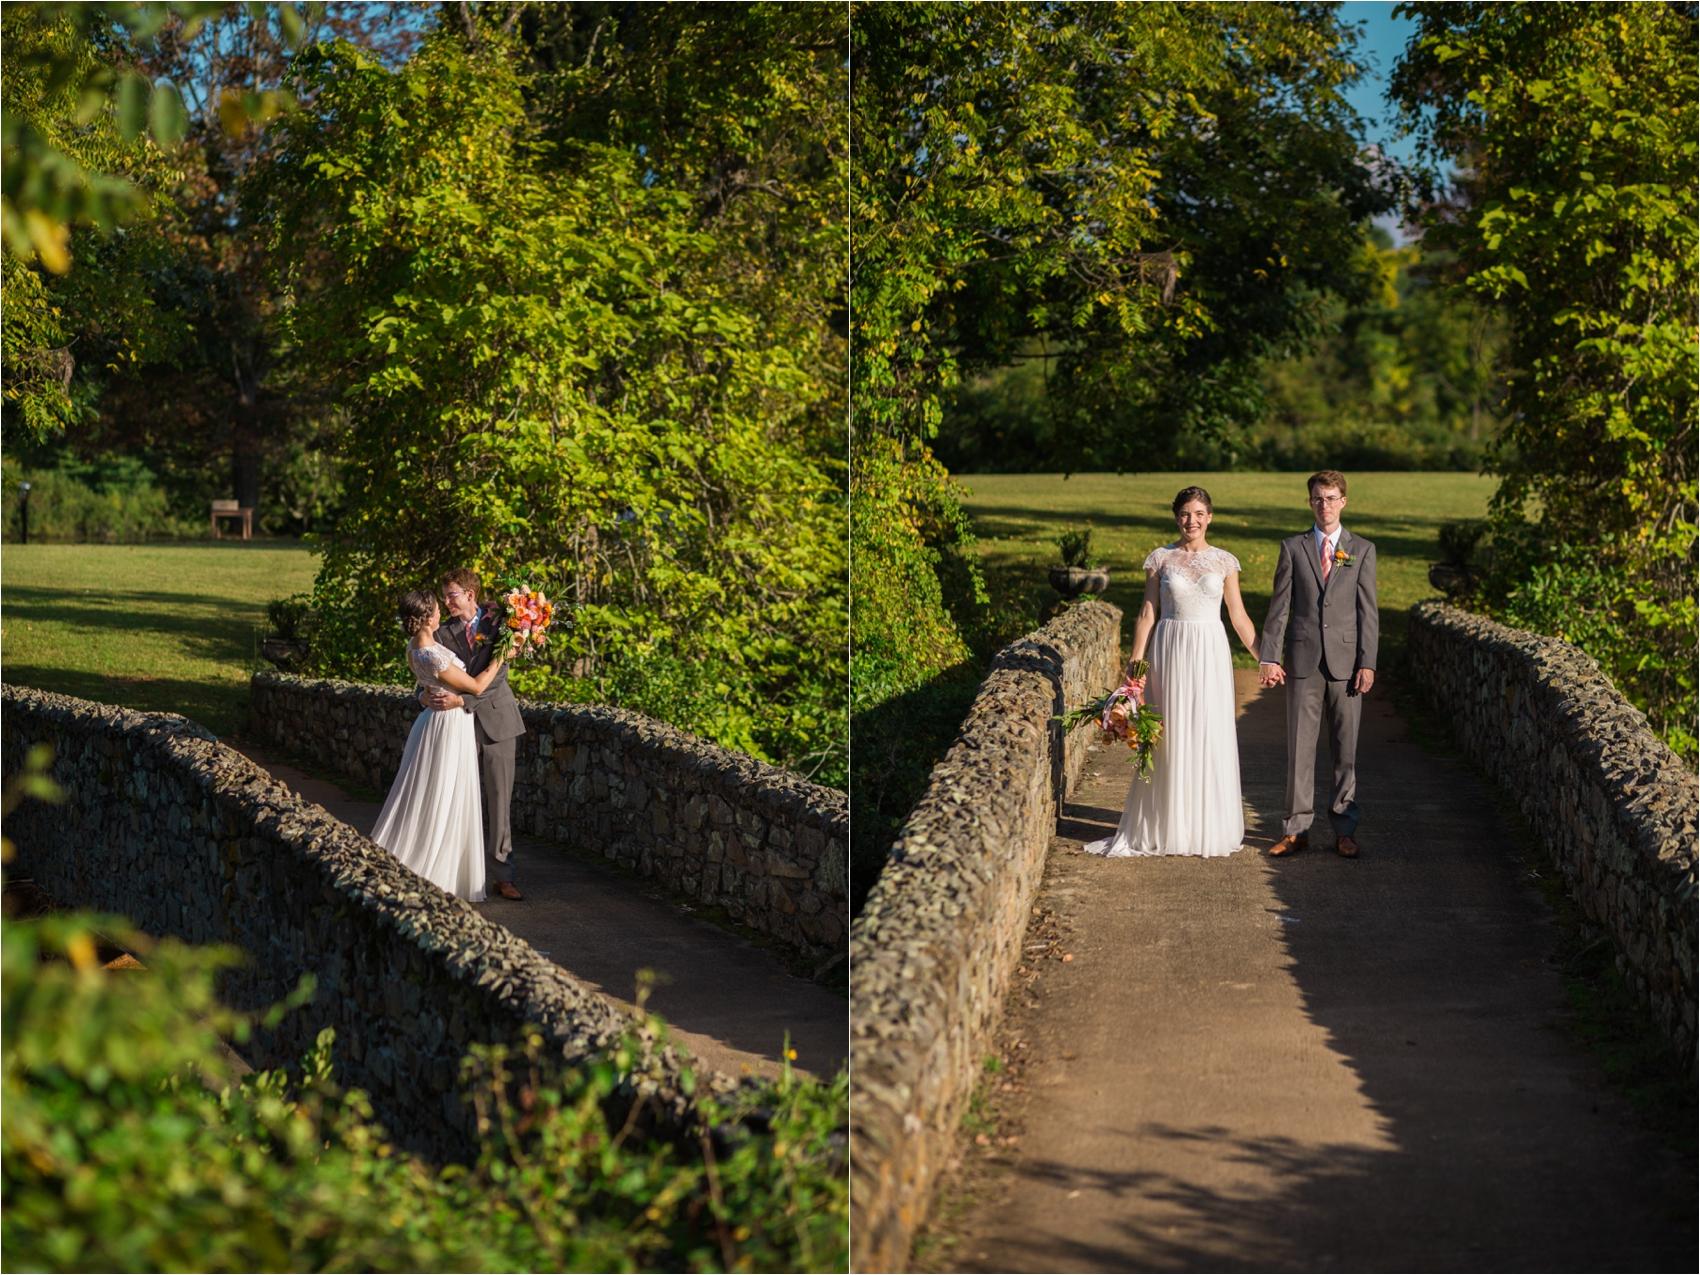 Feather-and-Oak-Rainforest-Trust-Virginia-Wedding-0778.jpg